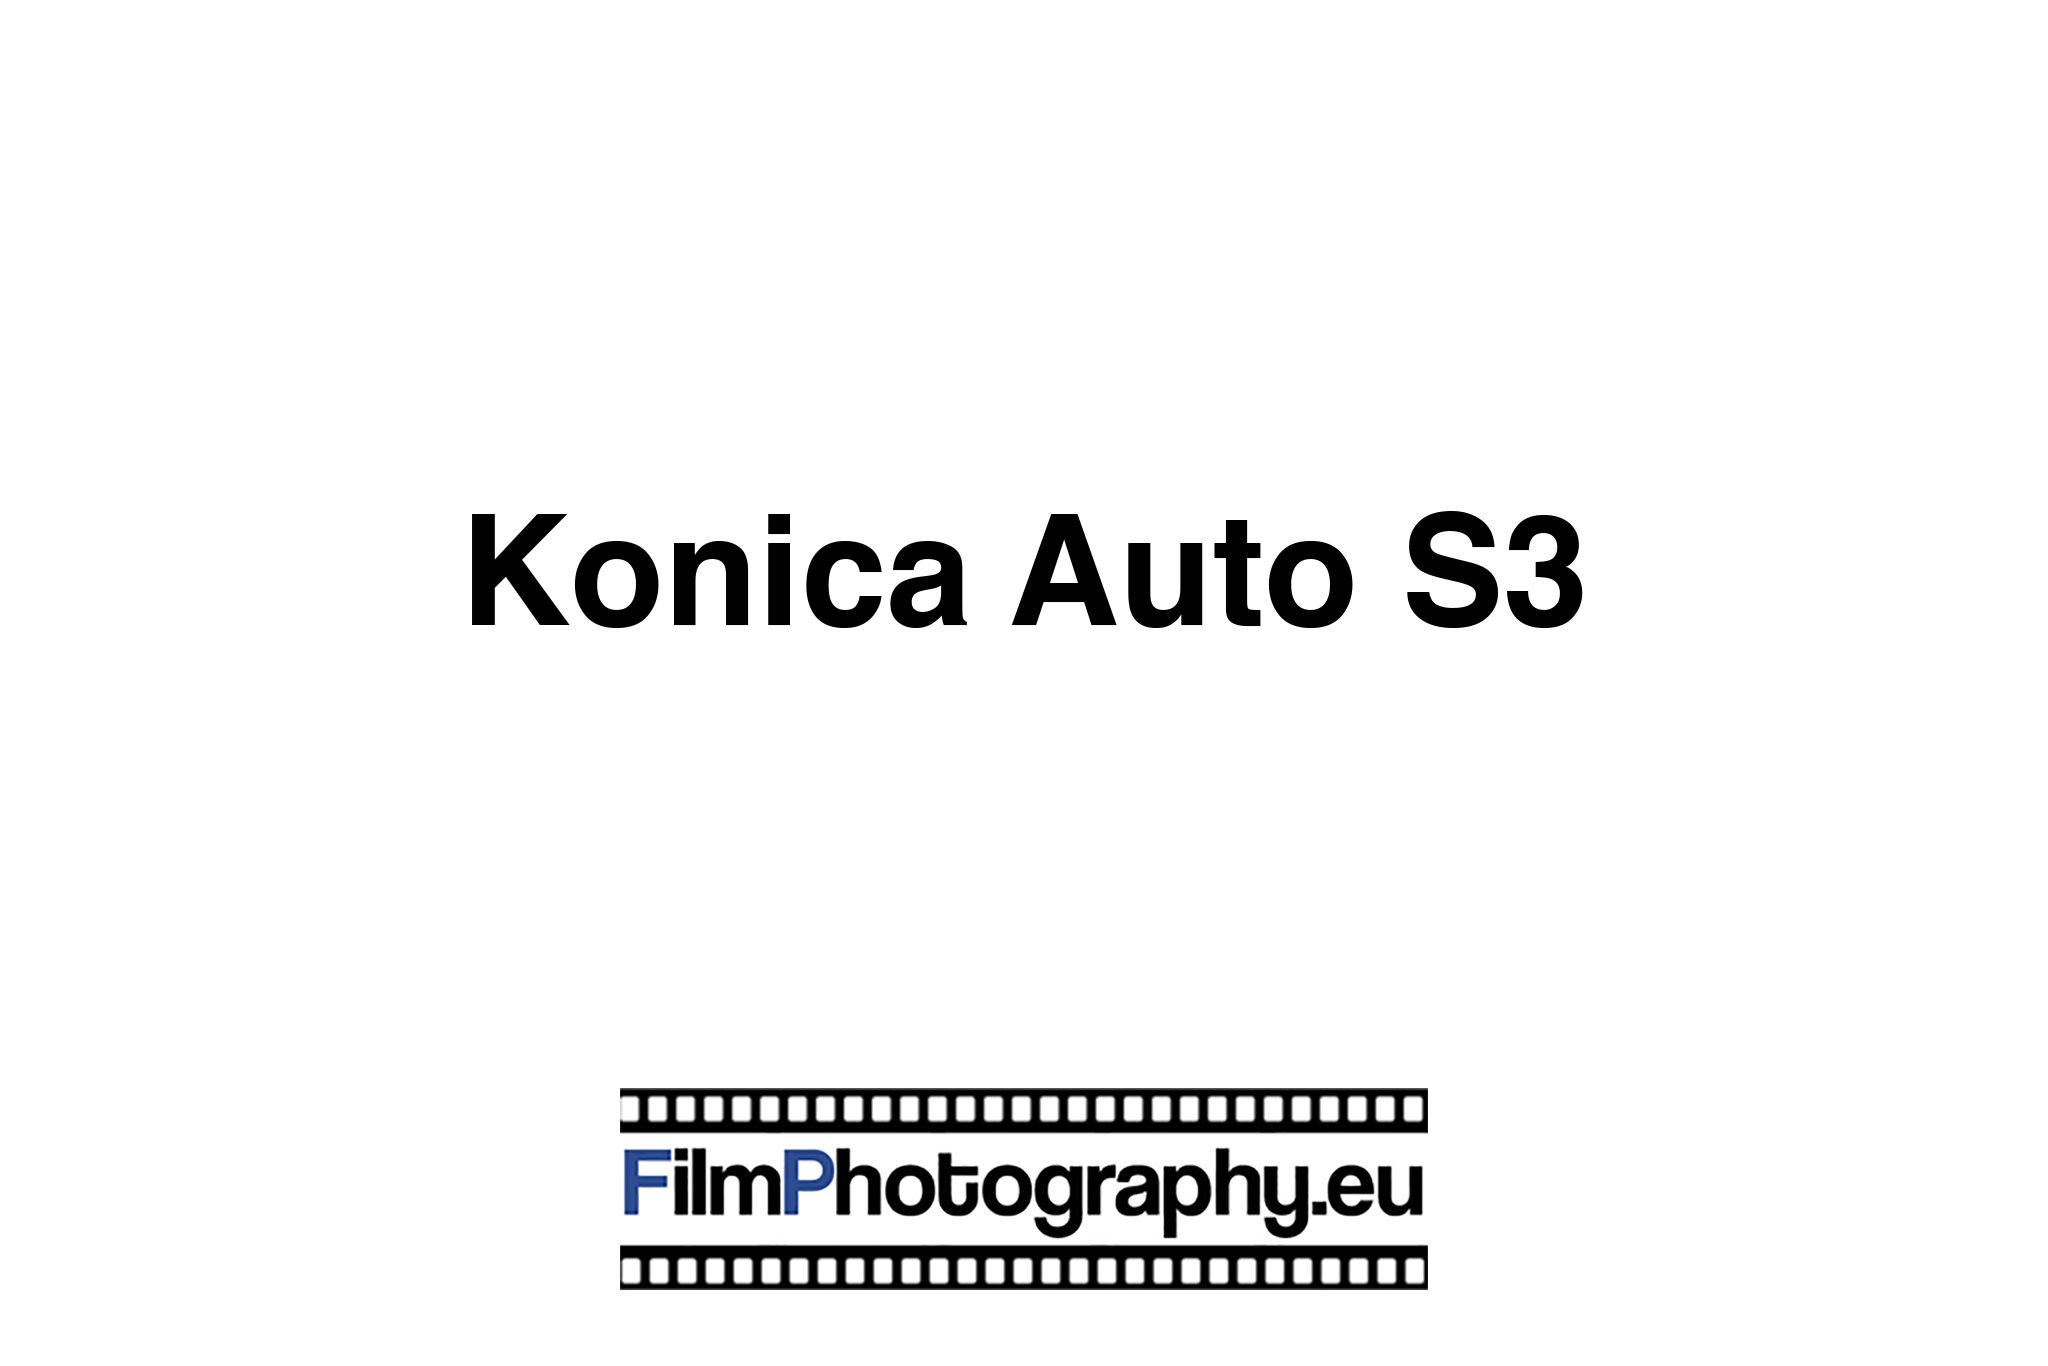 Konica Auto S3